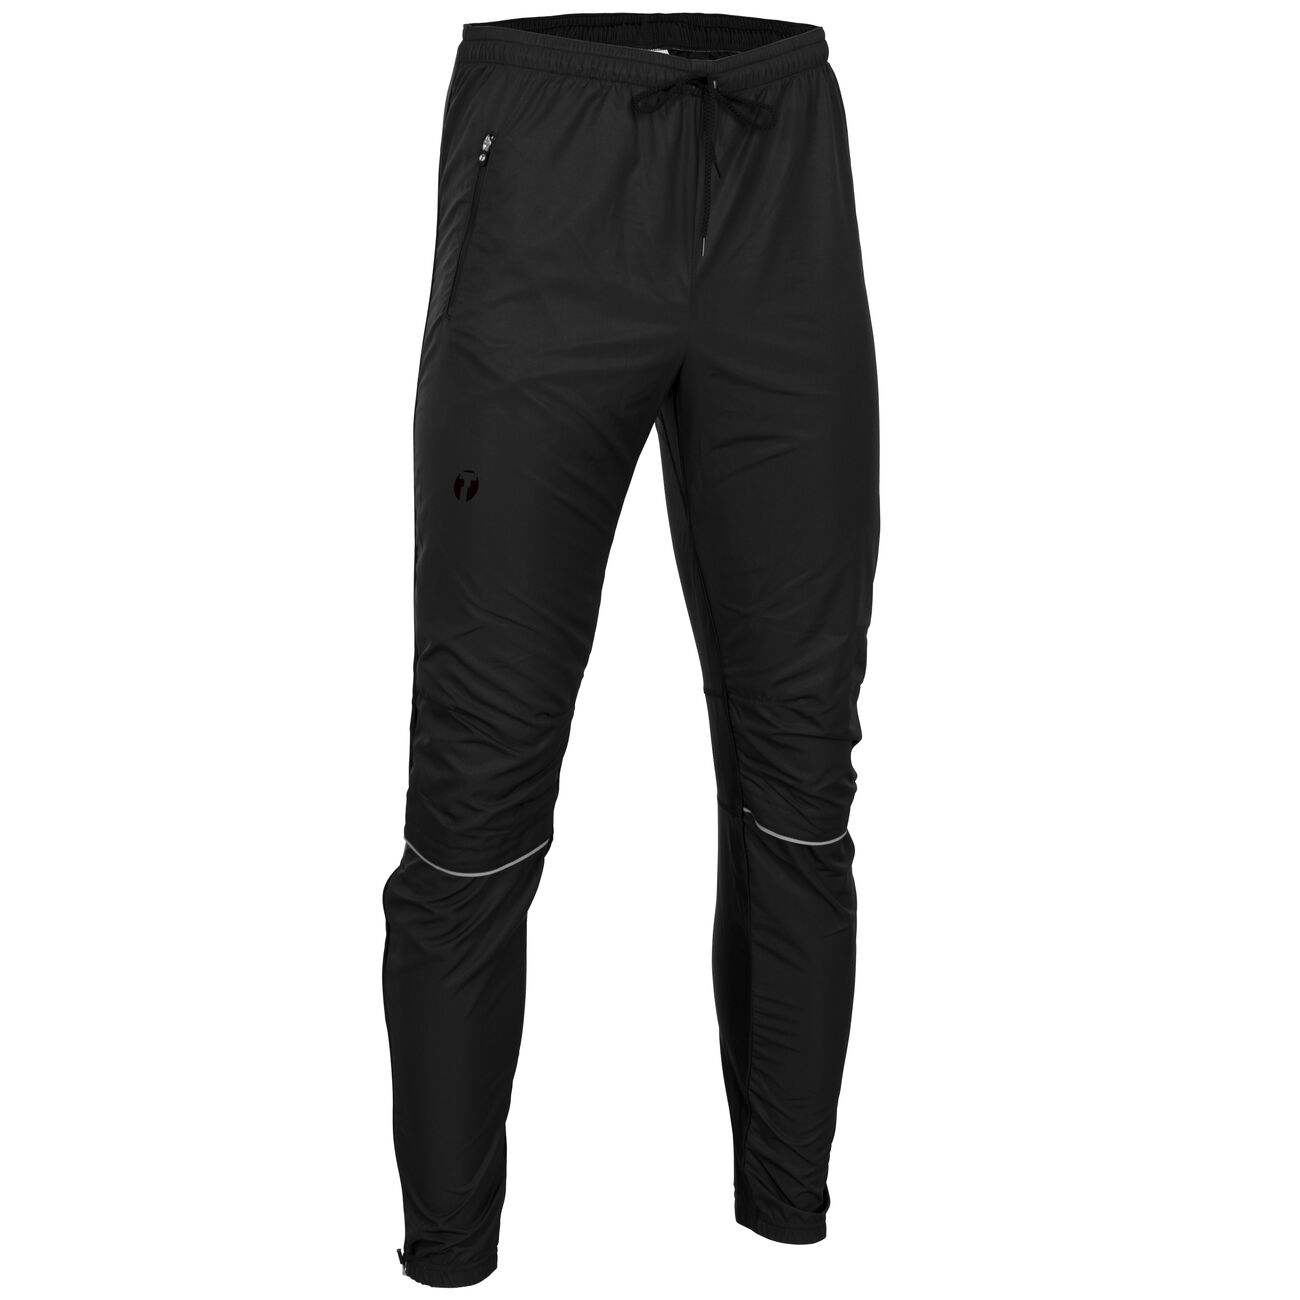 Trainer 2.0 training pants men's